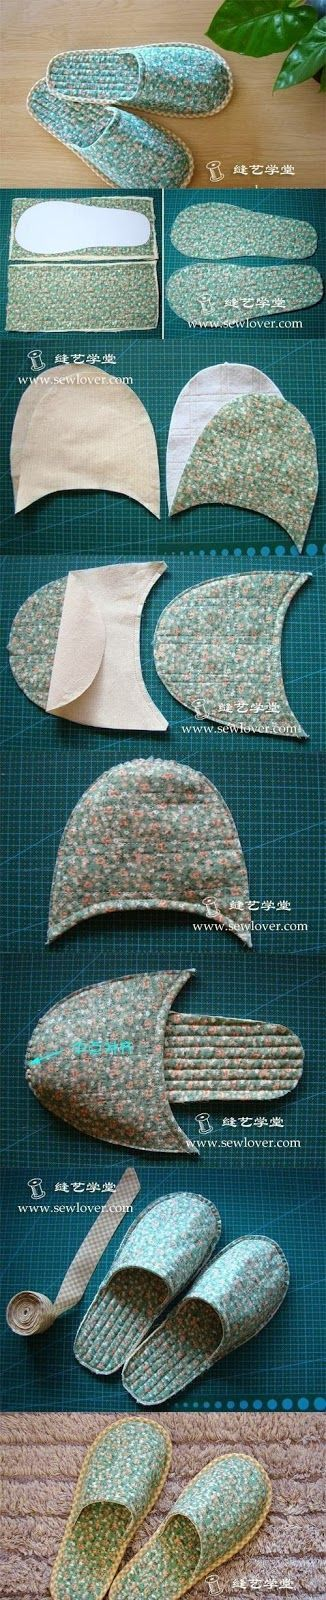 DIY : Sew Slipper